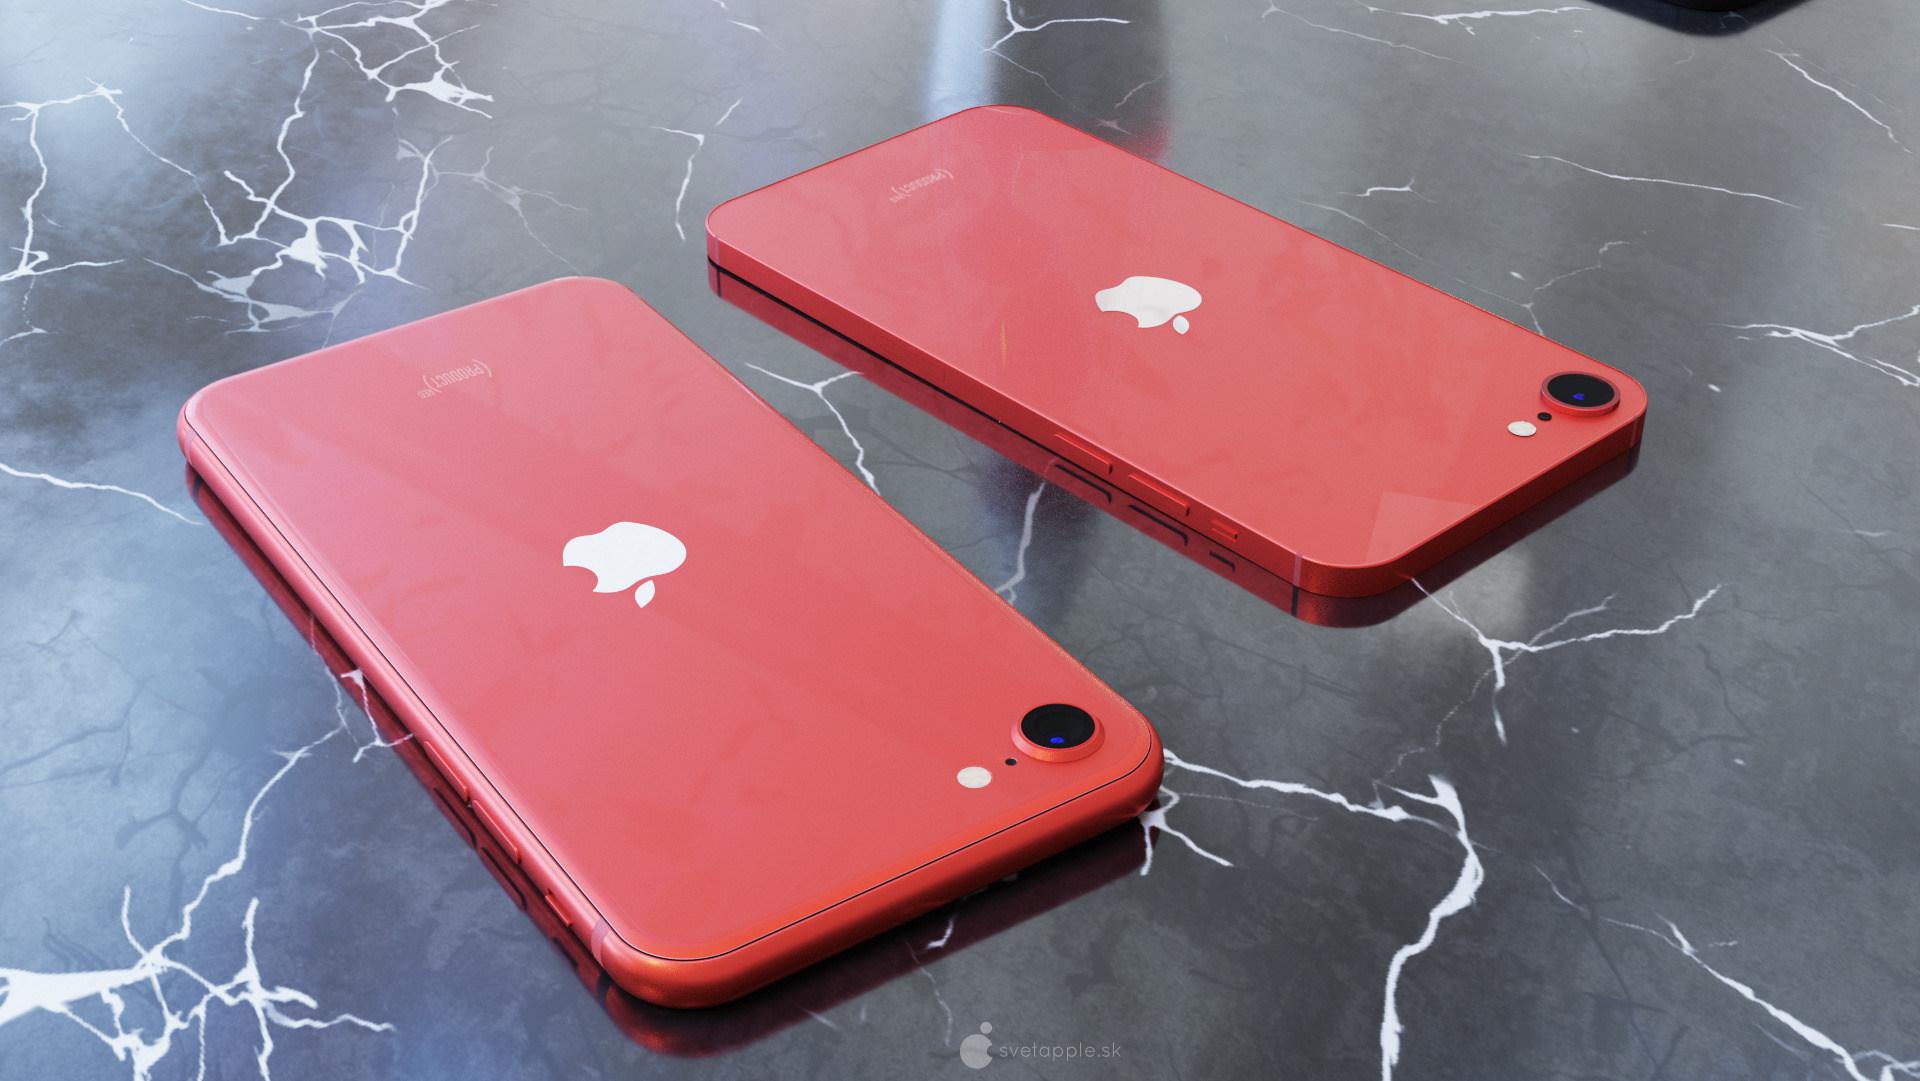 Apple iPhone SE (2021) Konzept - WinFuture.de